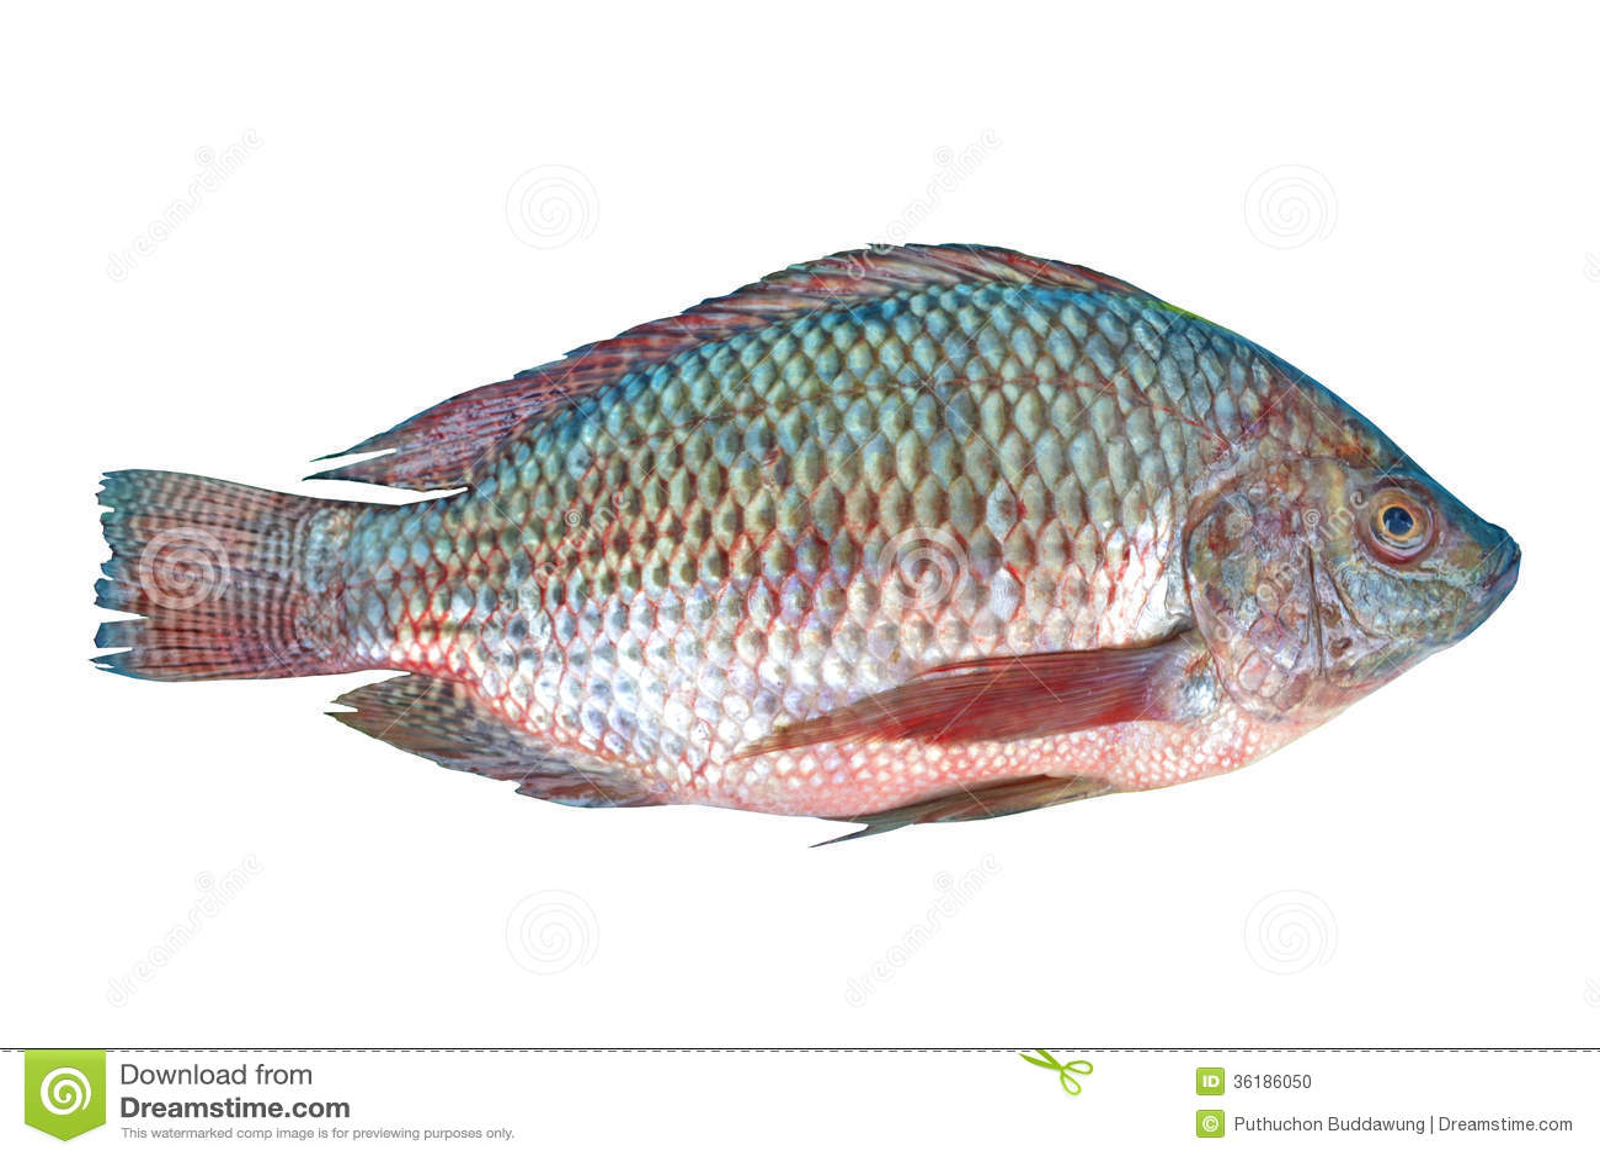 Nile tilapia fish stock photo image 36186050 for Fishing for tilapia